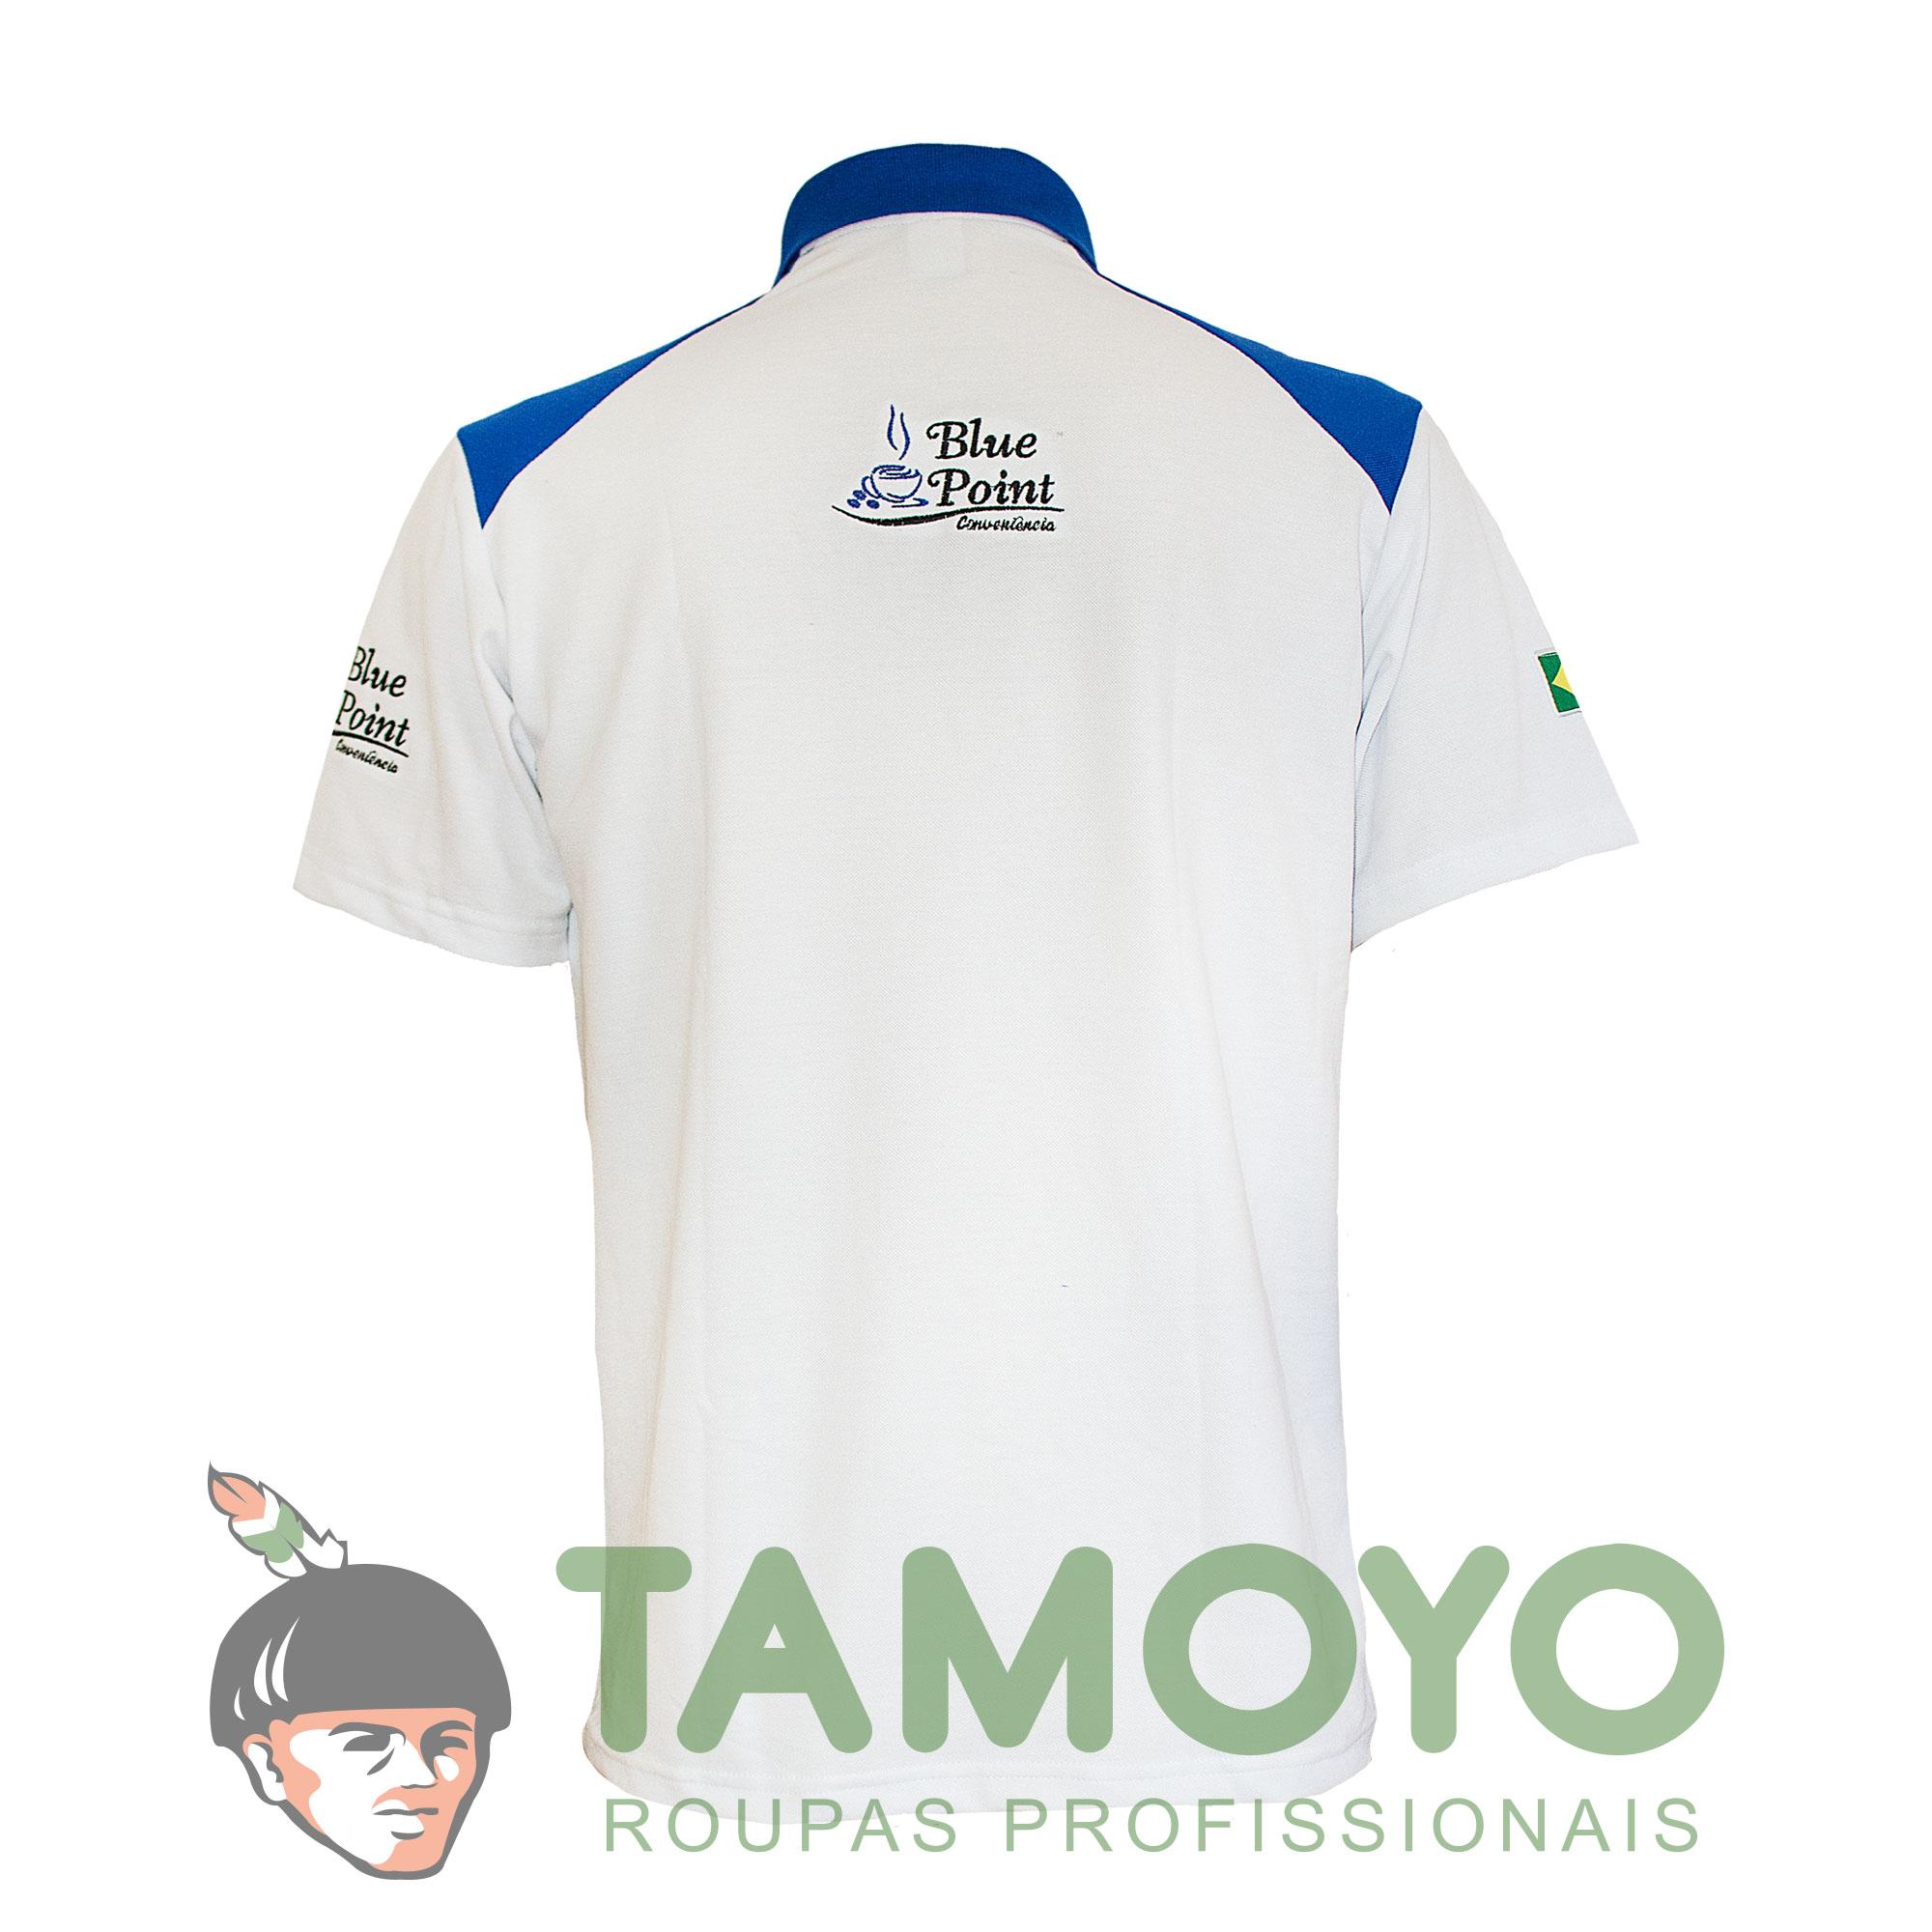 camiseta-polo-masculina-roupas-tamoyo-uniformes-profissionais-c